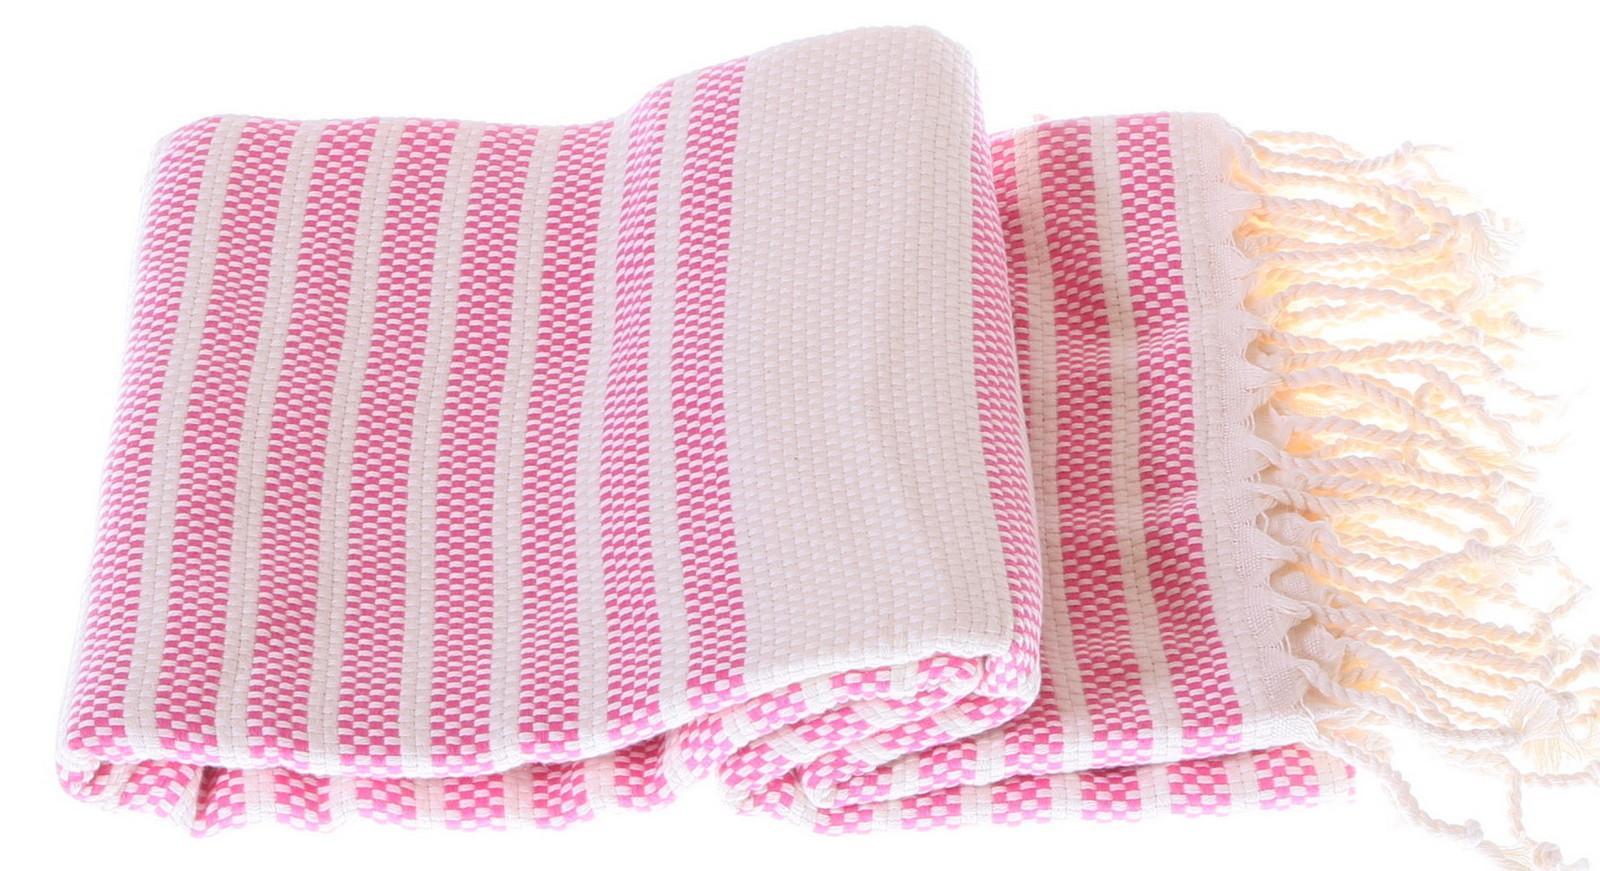 Marmara style 100% cotton hammam towel in pink